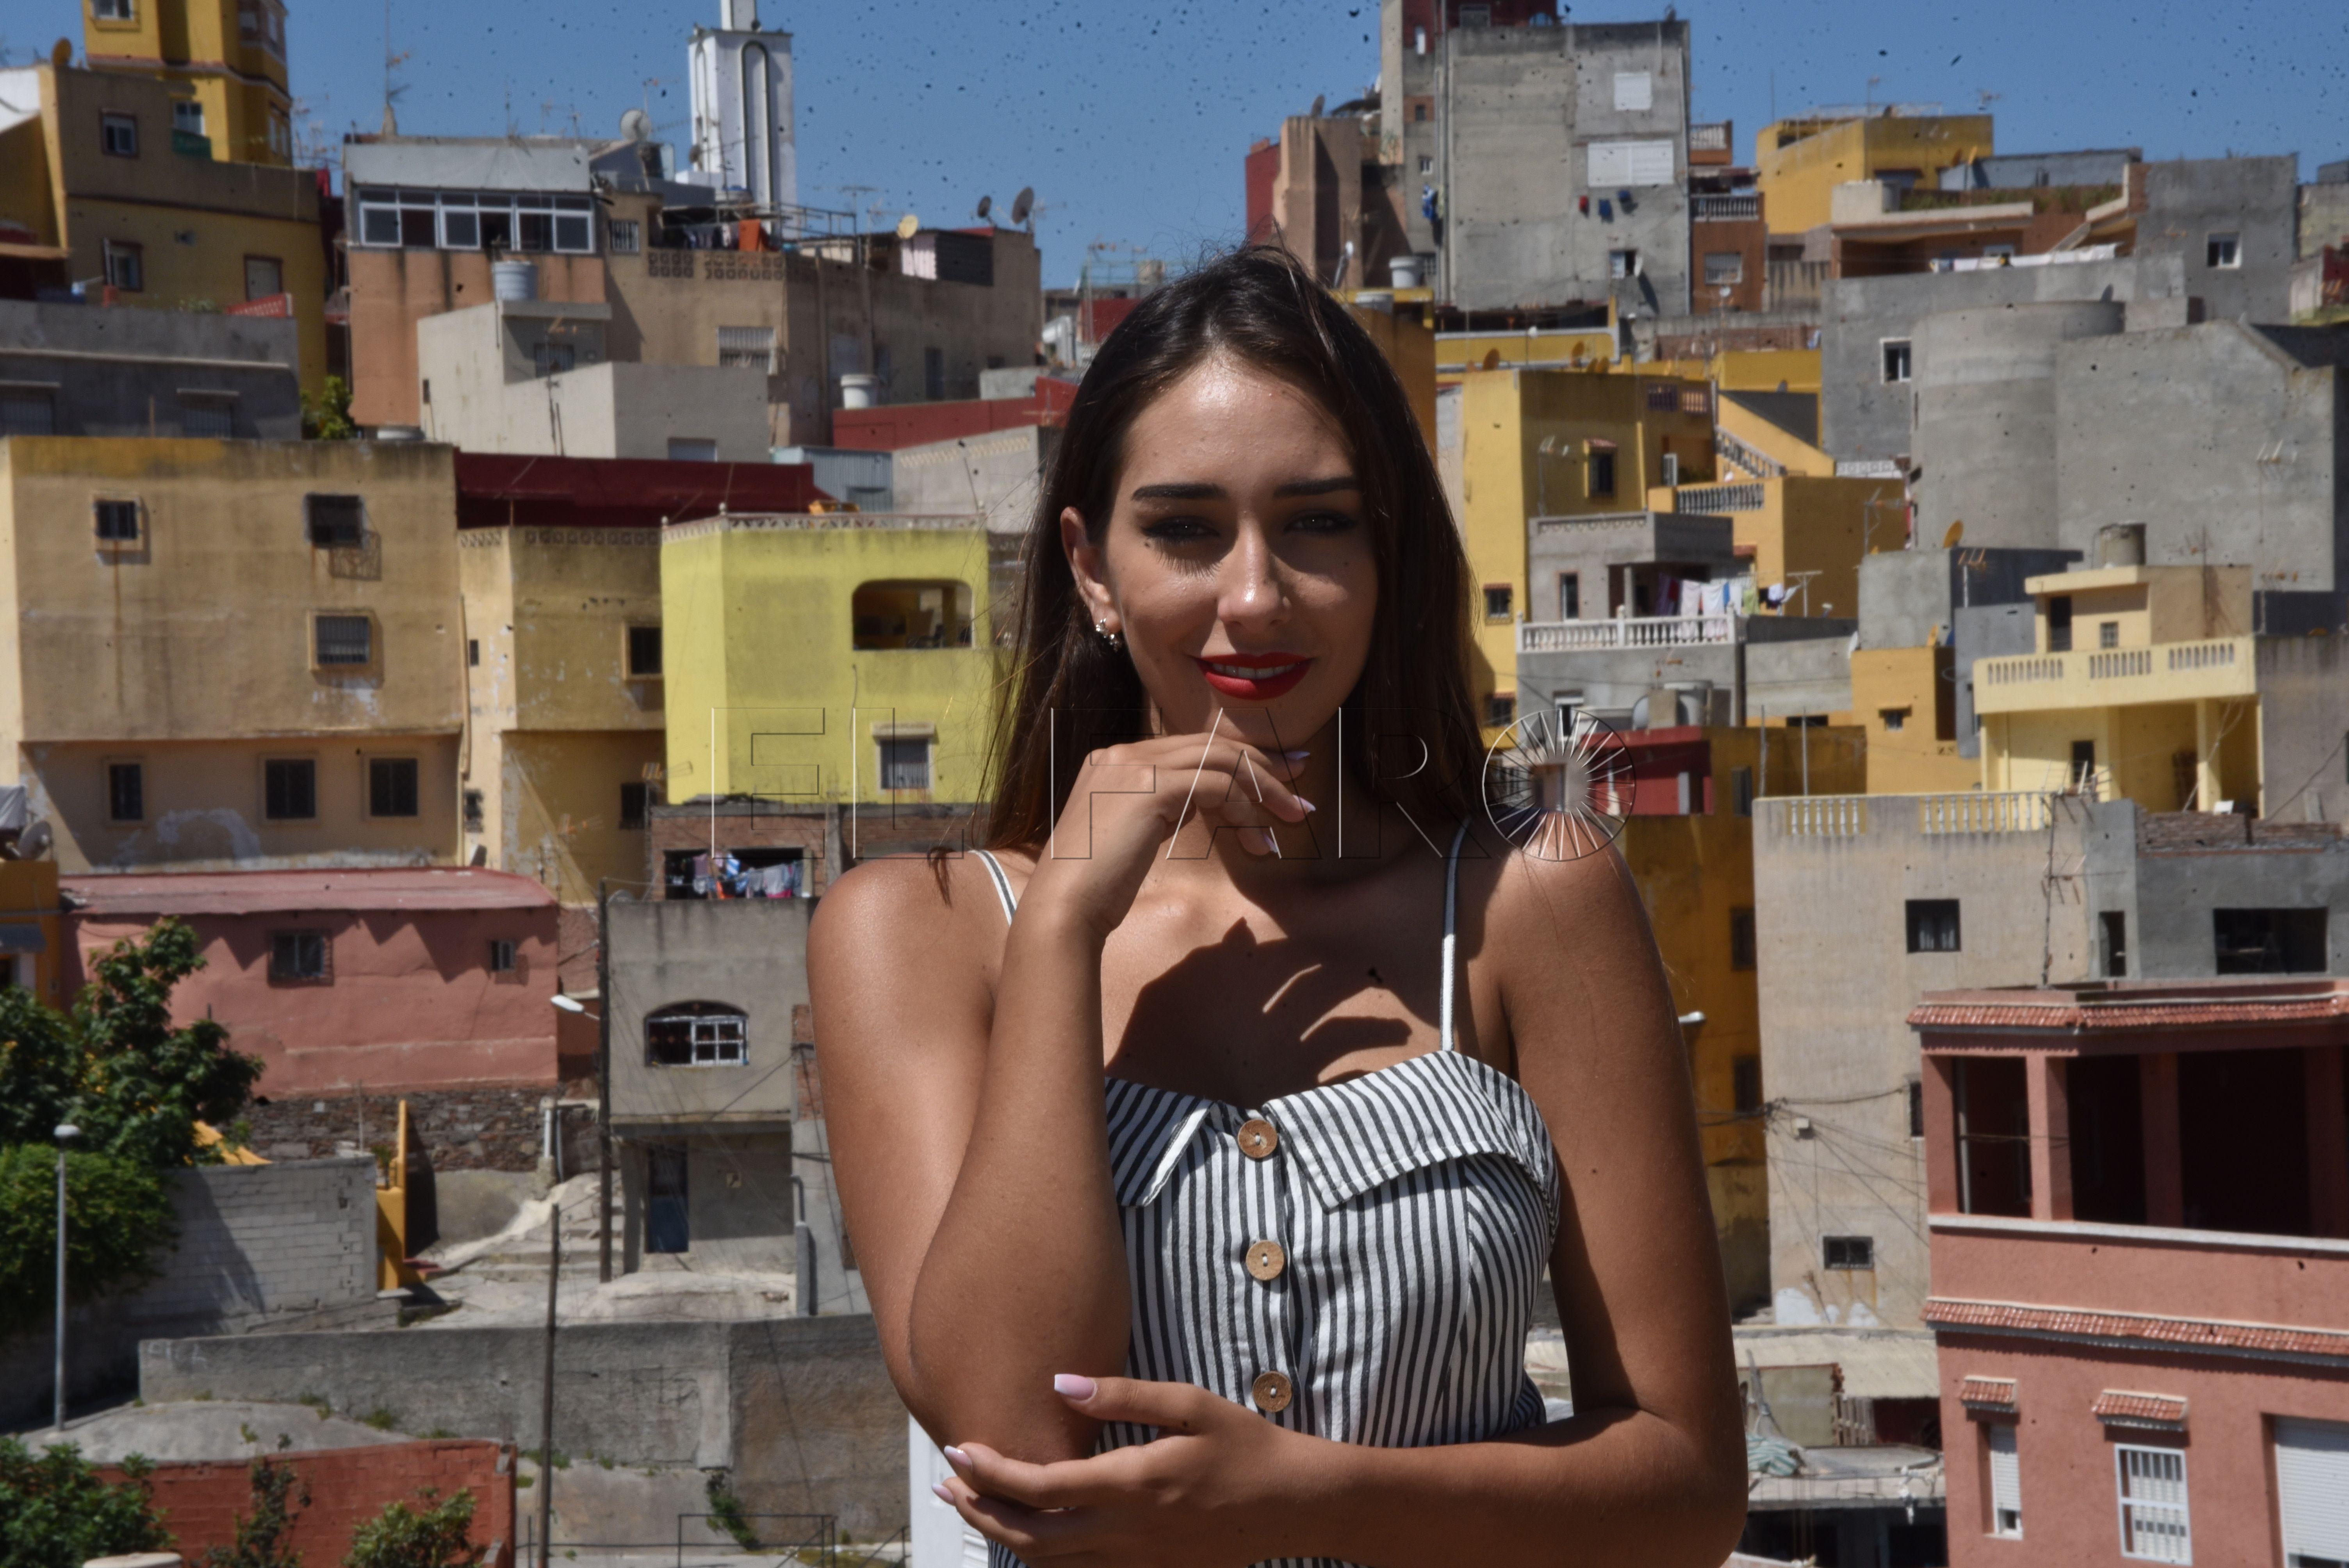 Feminista, futura guardia civil y modelo: Sara Martínez, la candidata ceutí a Miss Mundo 2019 1sLYor